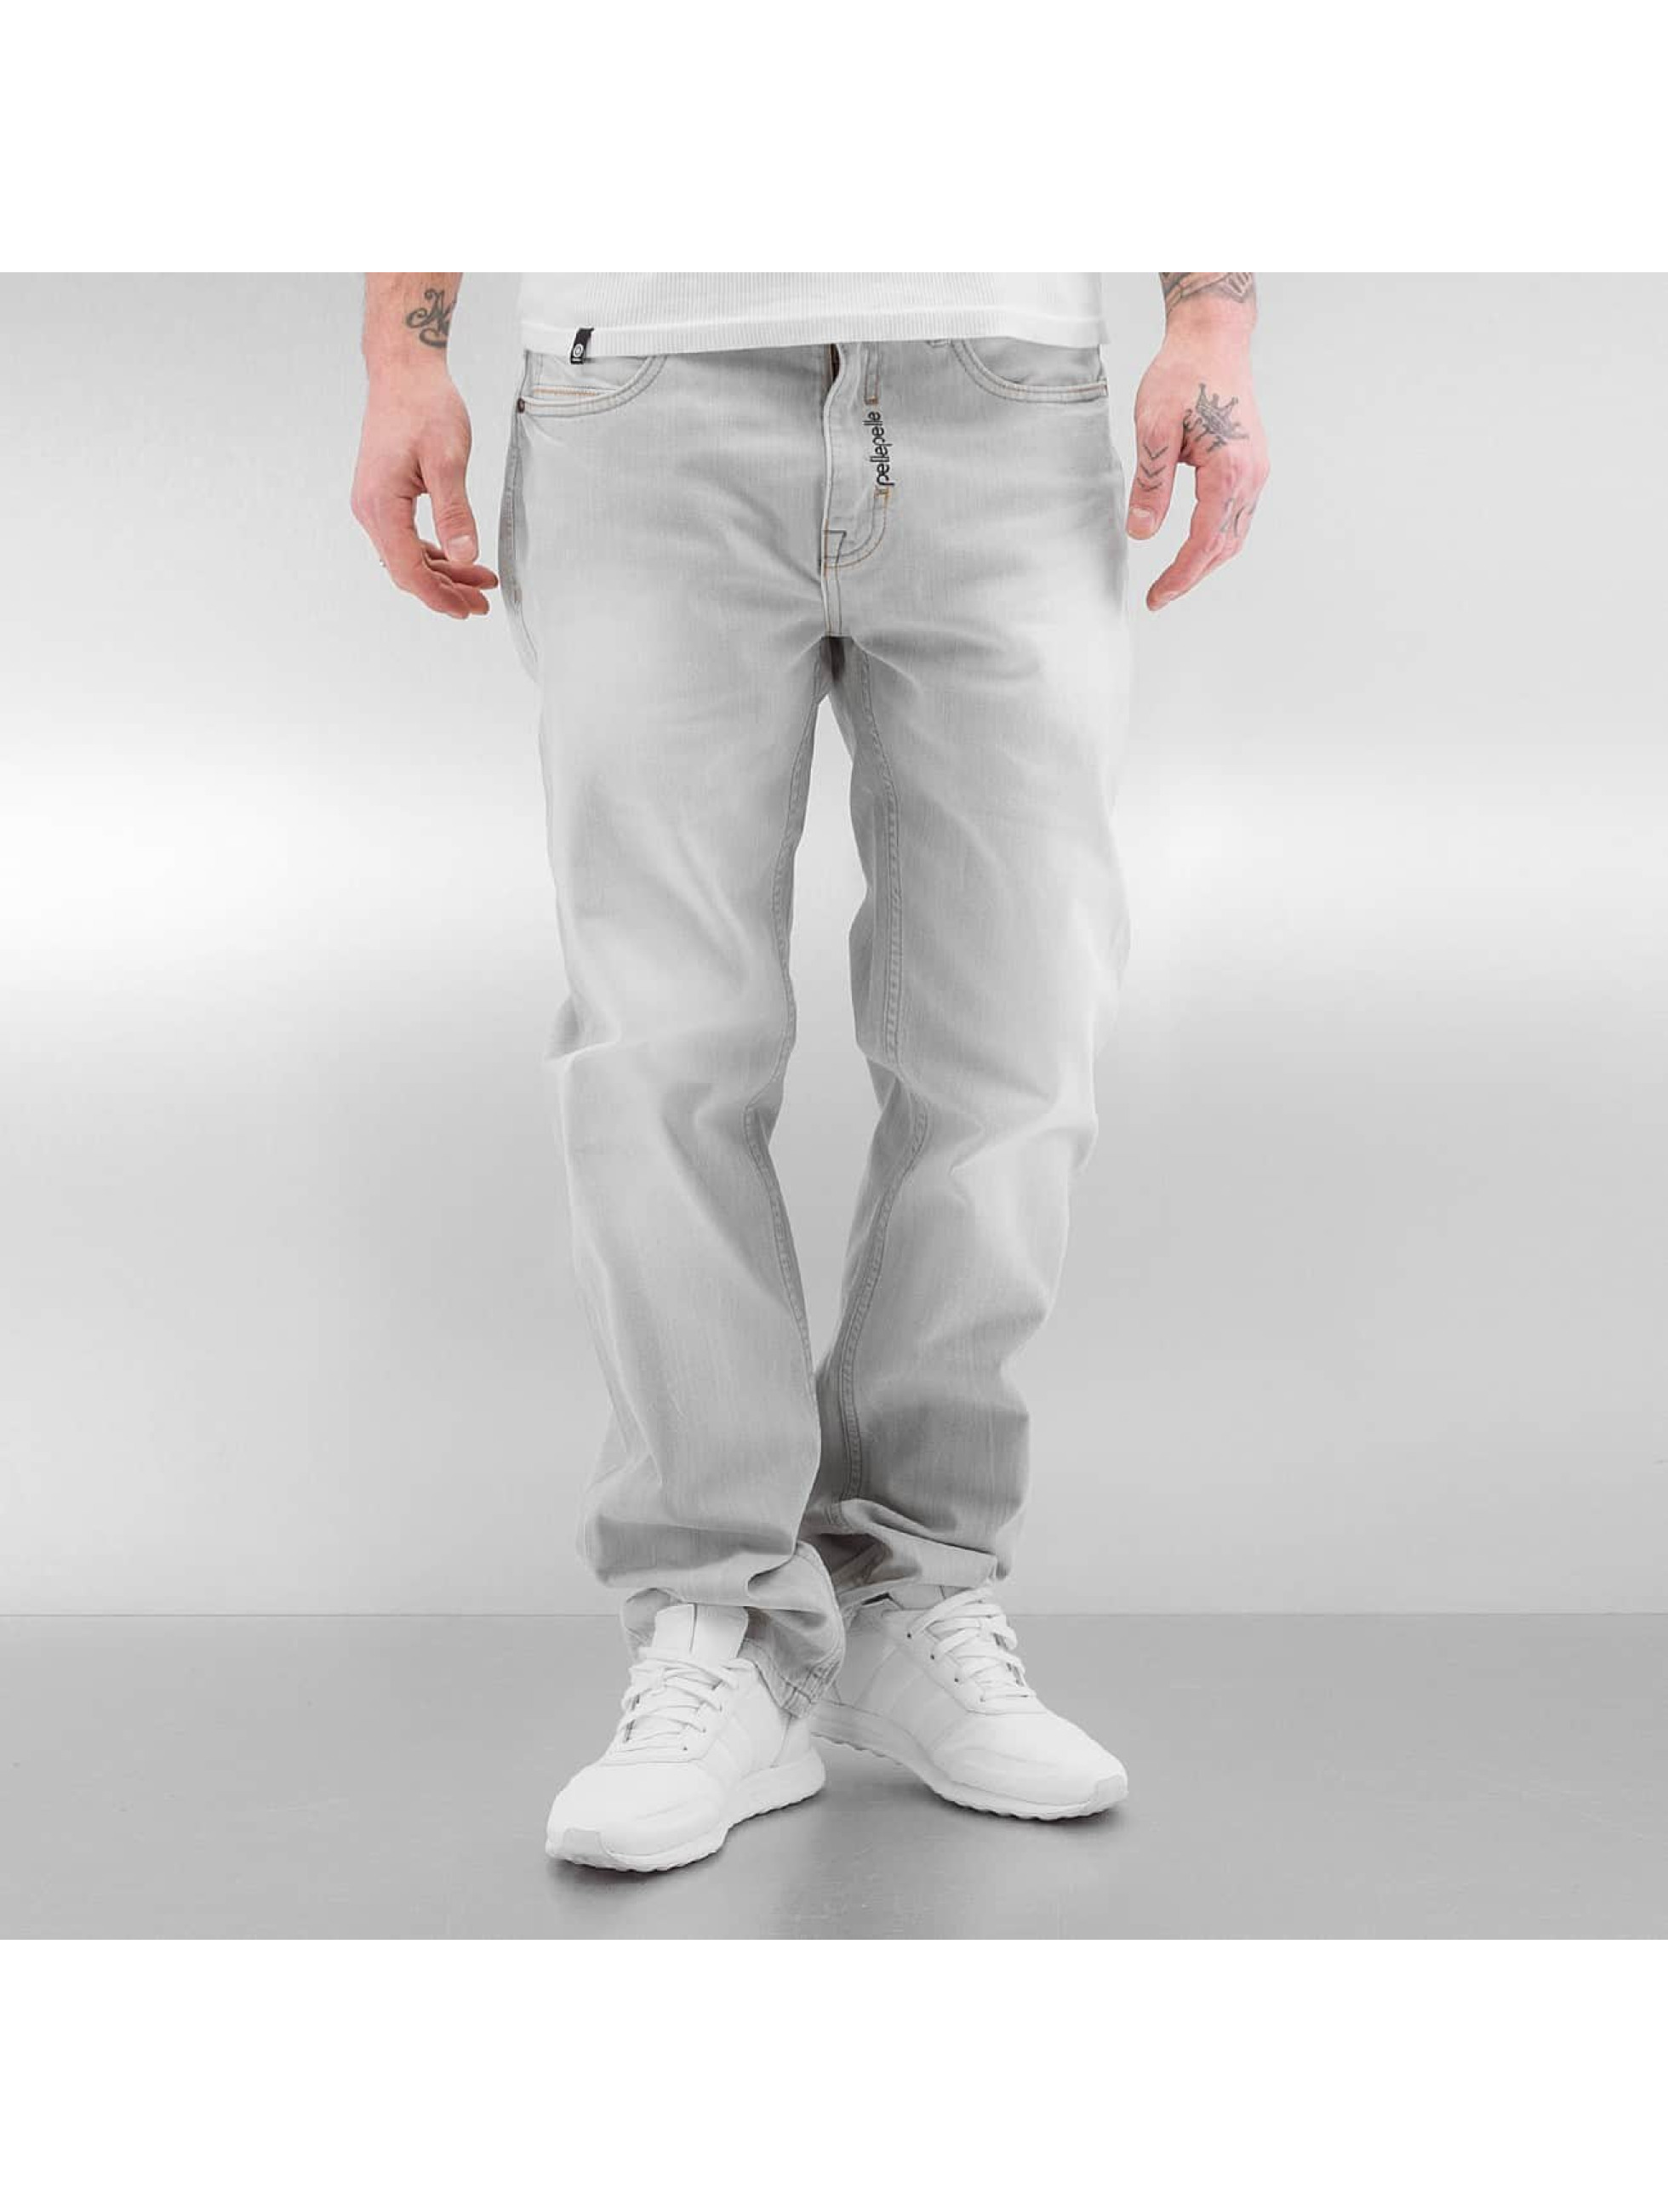 Pelle Pelle Männer Loose Fit Jeans Baxter in grau